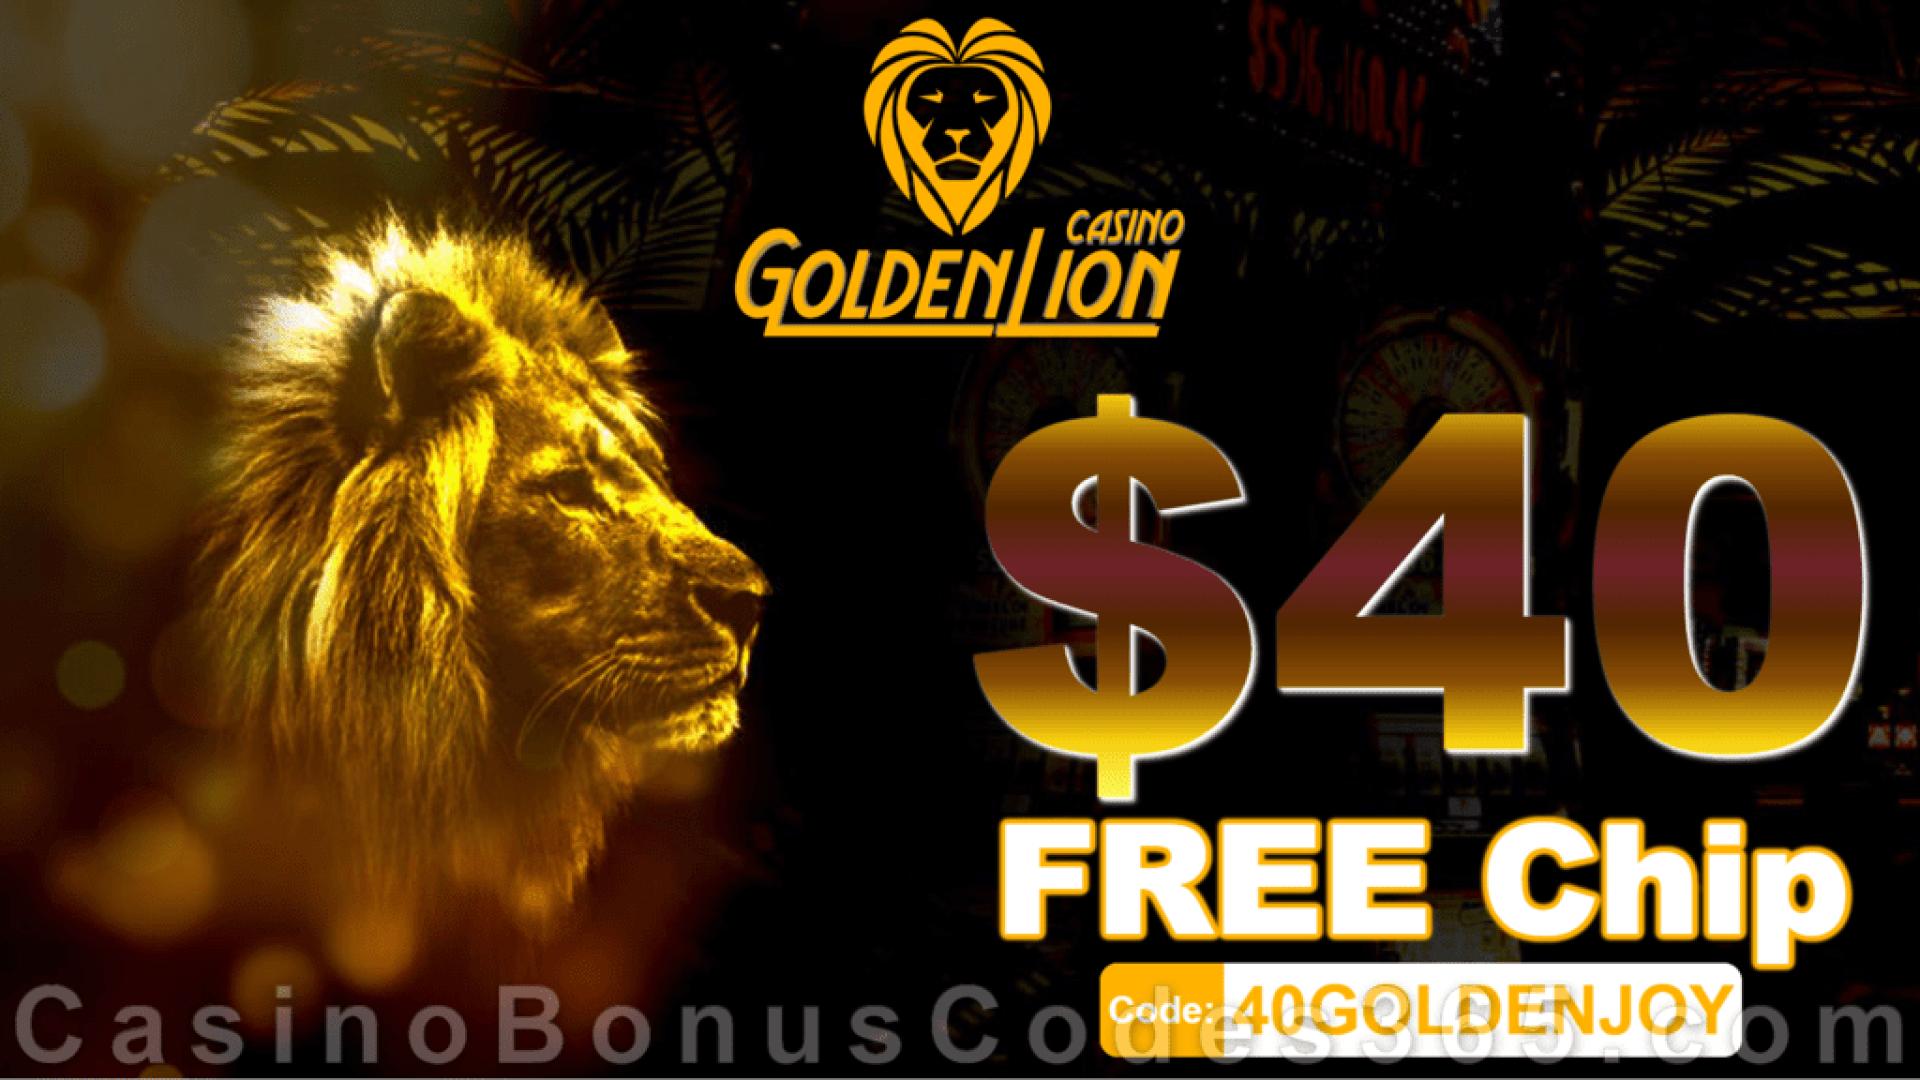 Golden Lion Casino Exclusive $40 No Deposit FREE Chip Welcome Bonus